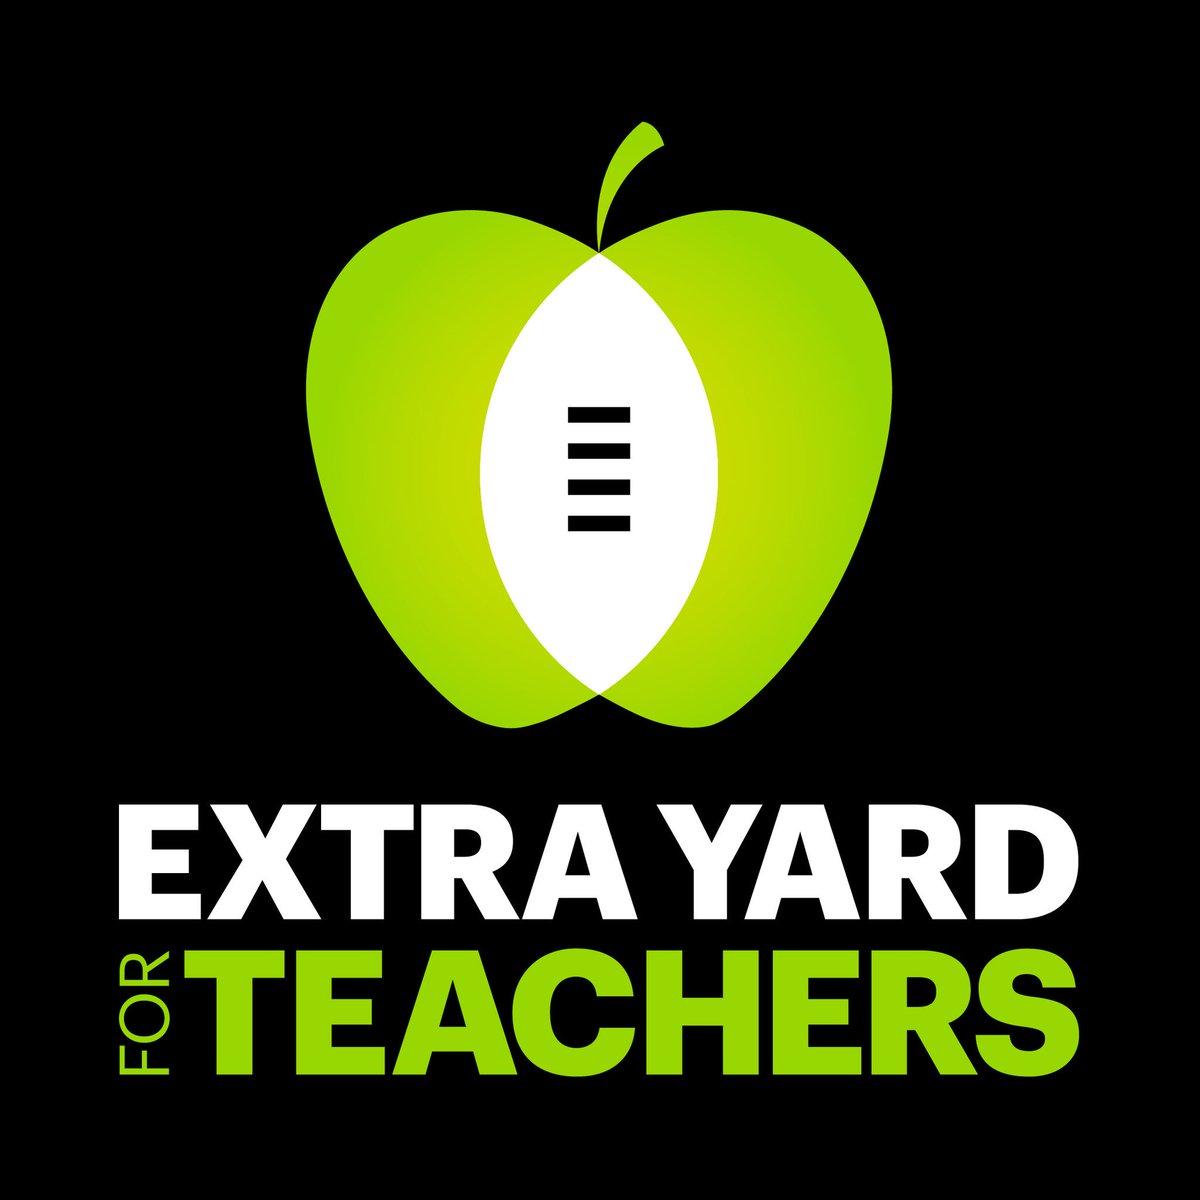 Join us in celebrating our educators during @CFPExtraYard week #ExtraYardWeek #outbackbowl